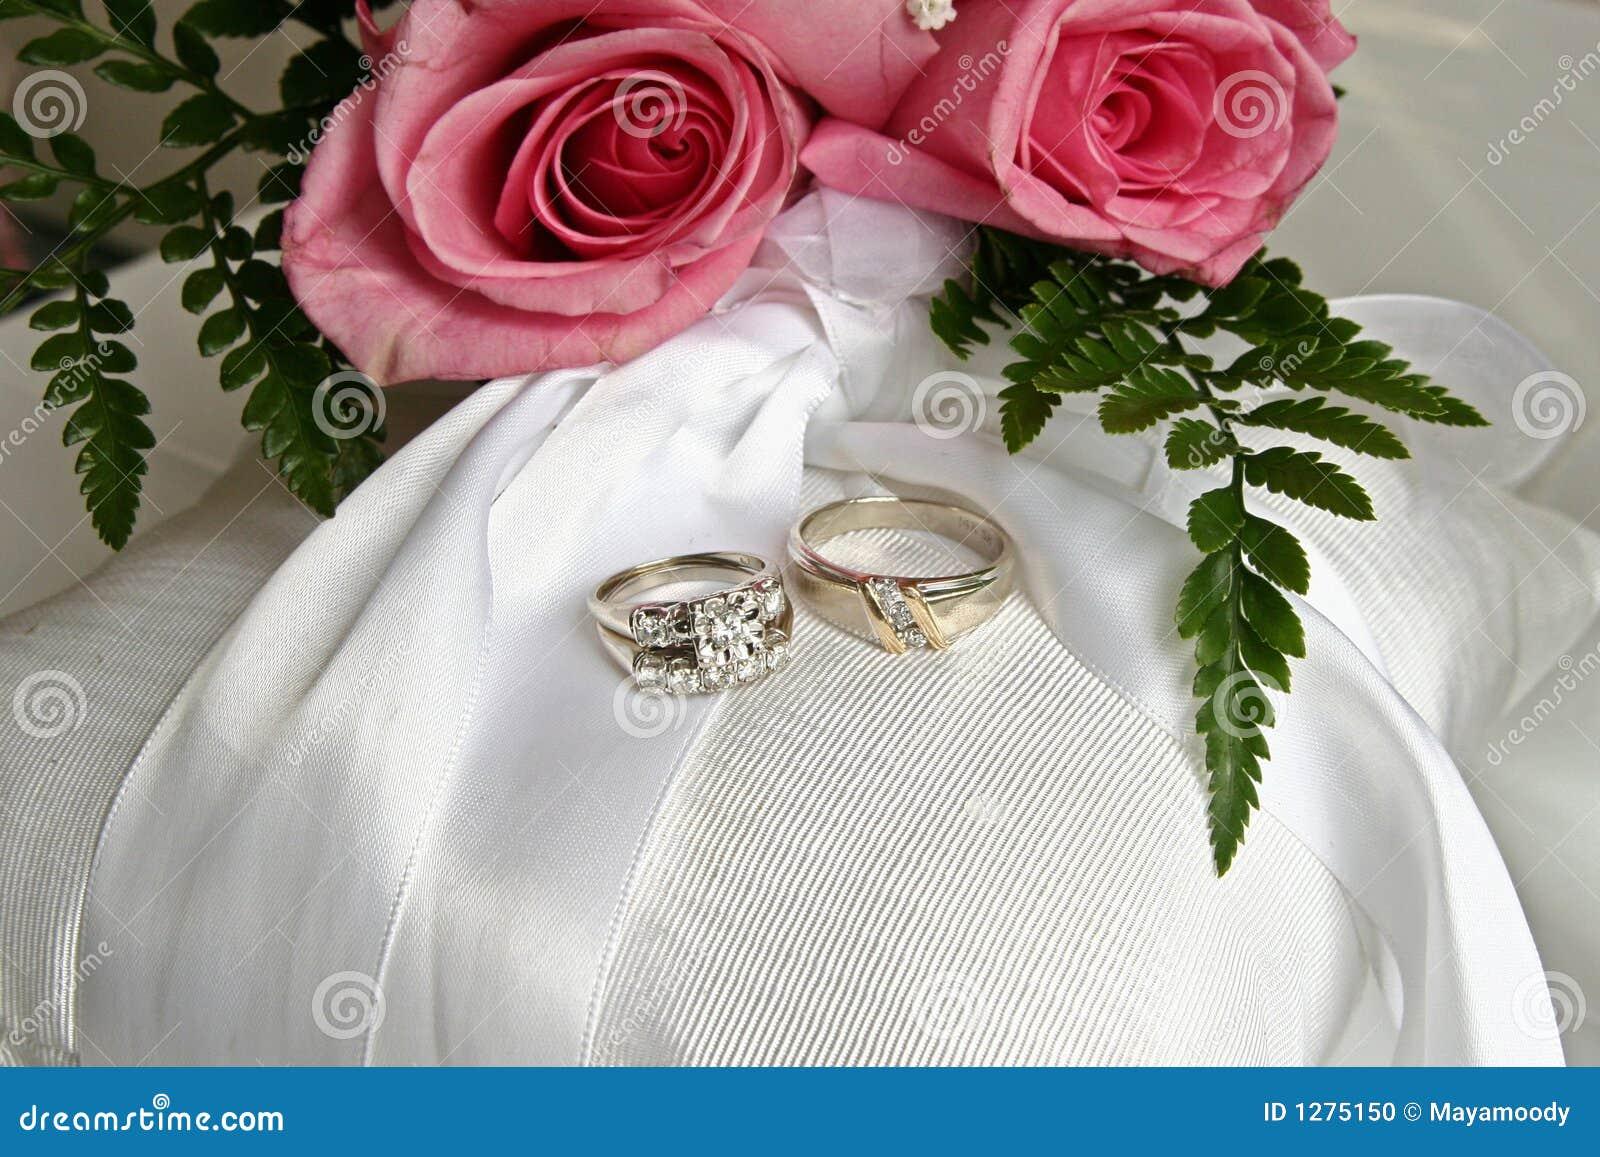 stock photo pink roses wedding rings image pink wedding rings Pink roses and wedding rings